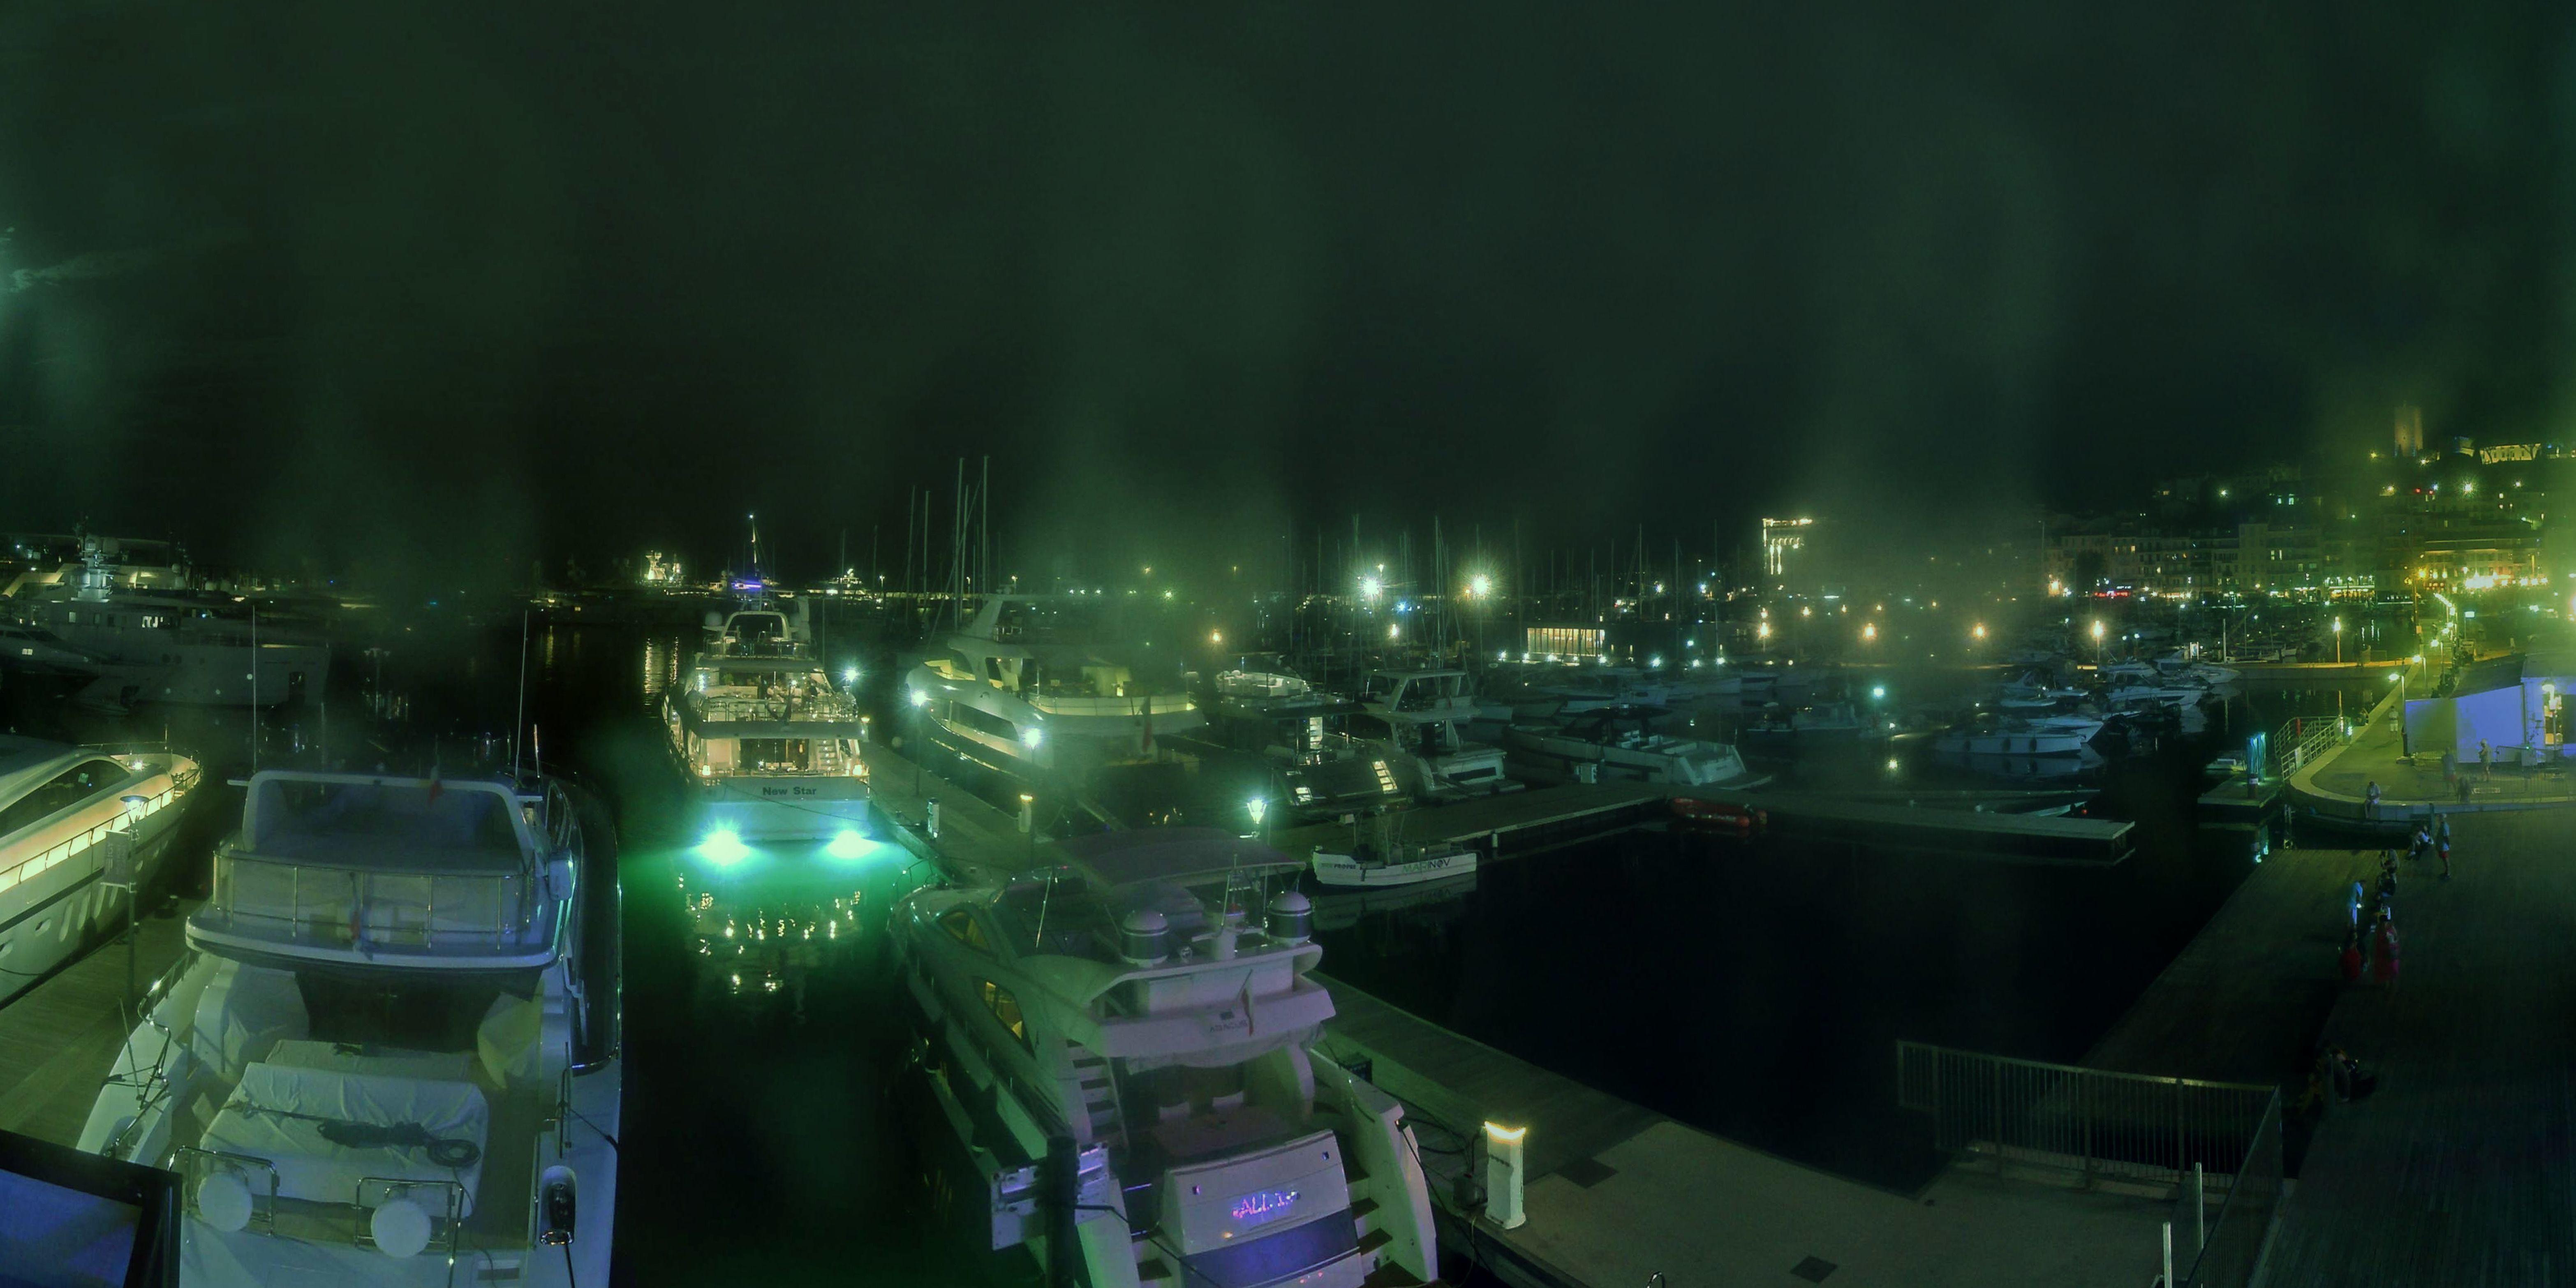 Cannes Mi. 00:36